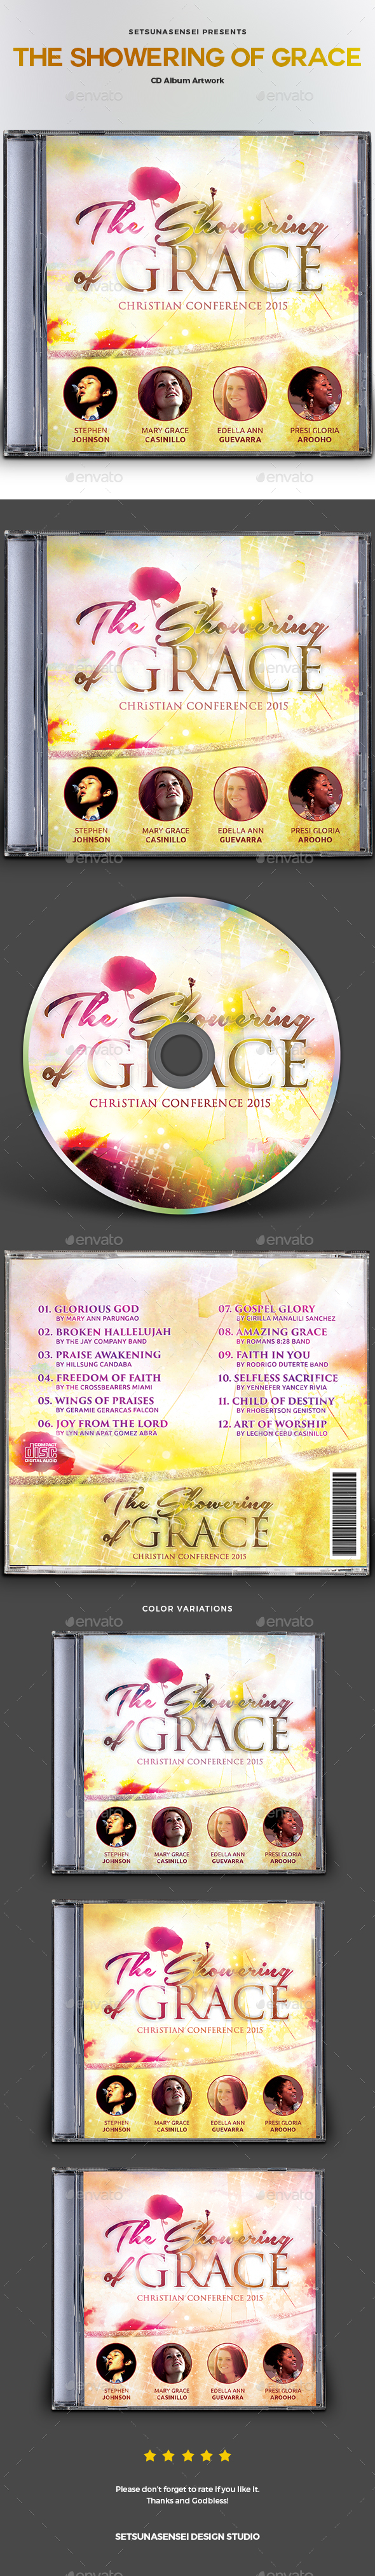 The Showering of Grace CD Album Artwork - CD & DVD Artwork Print Templates